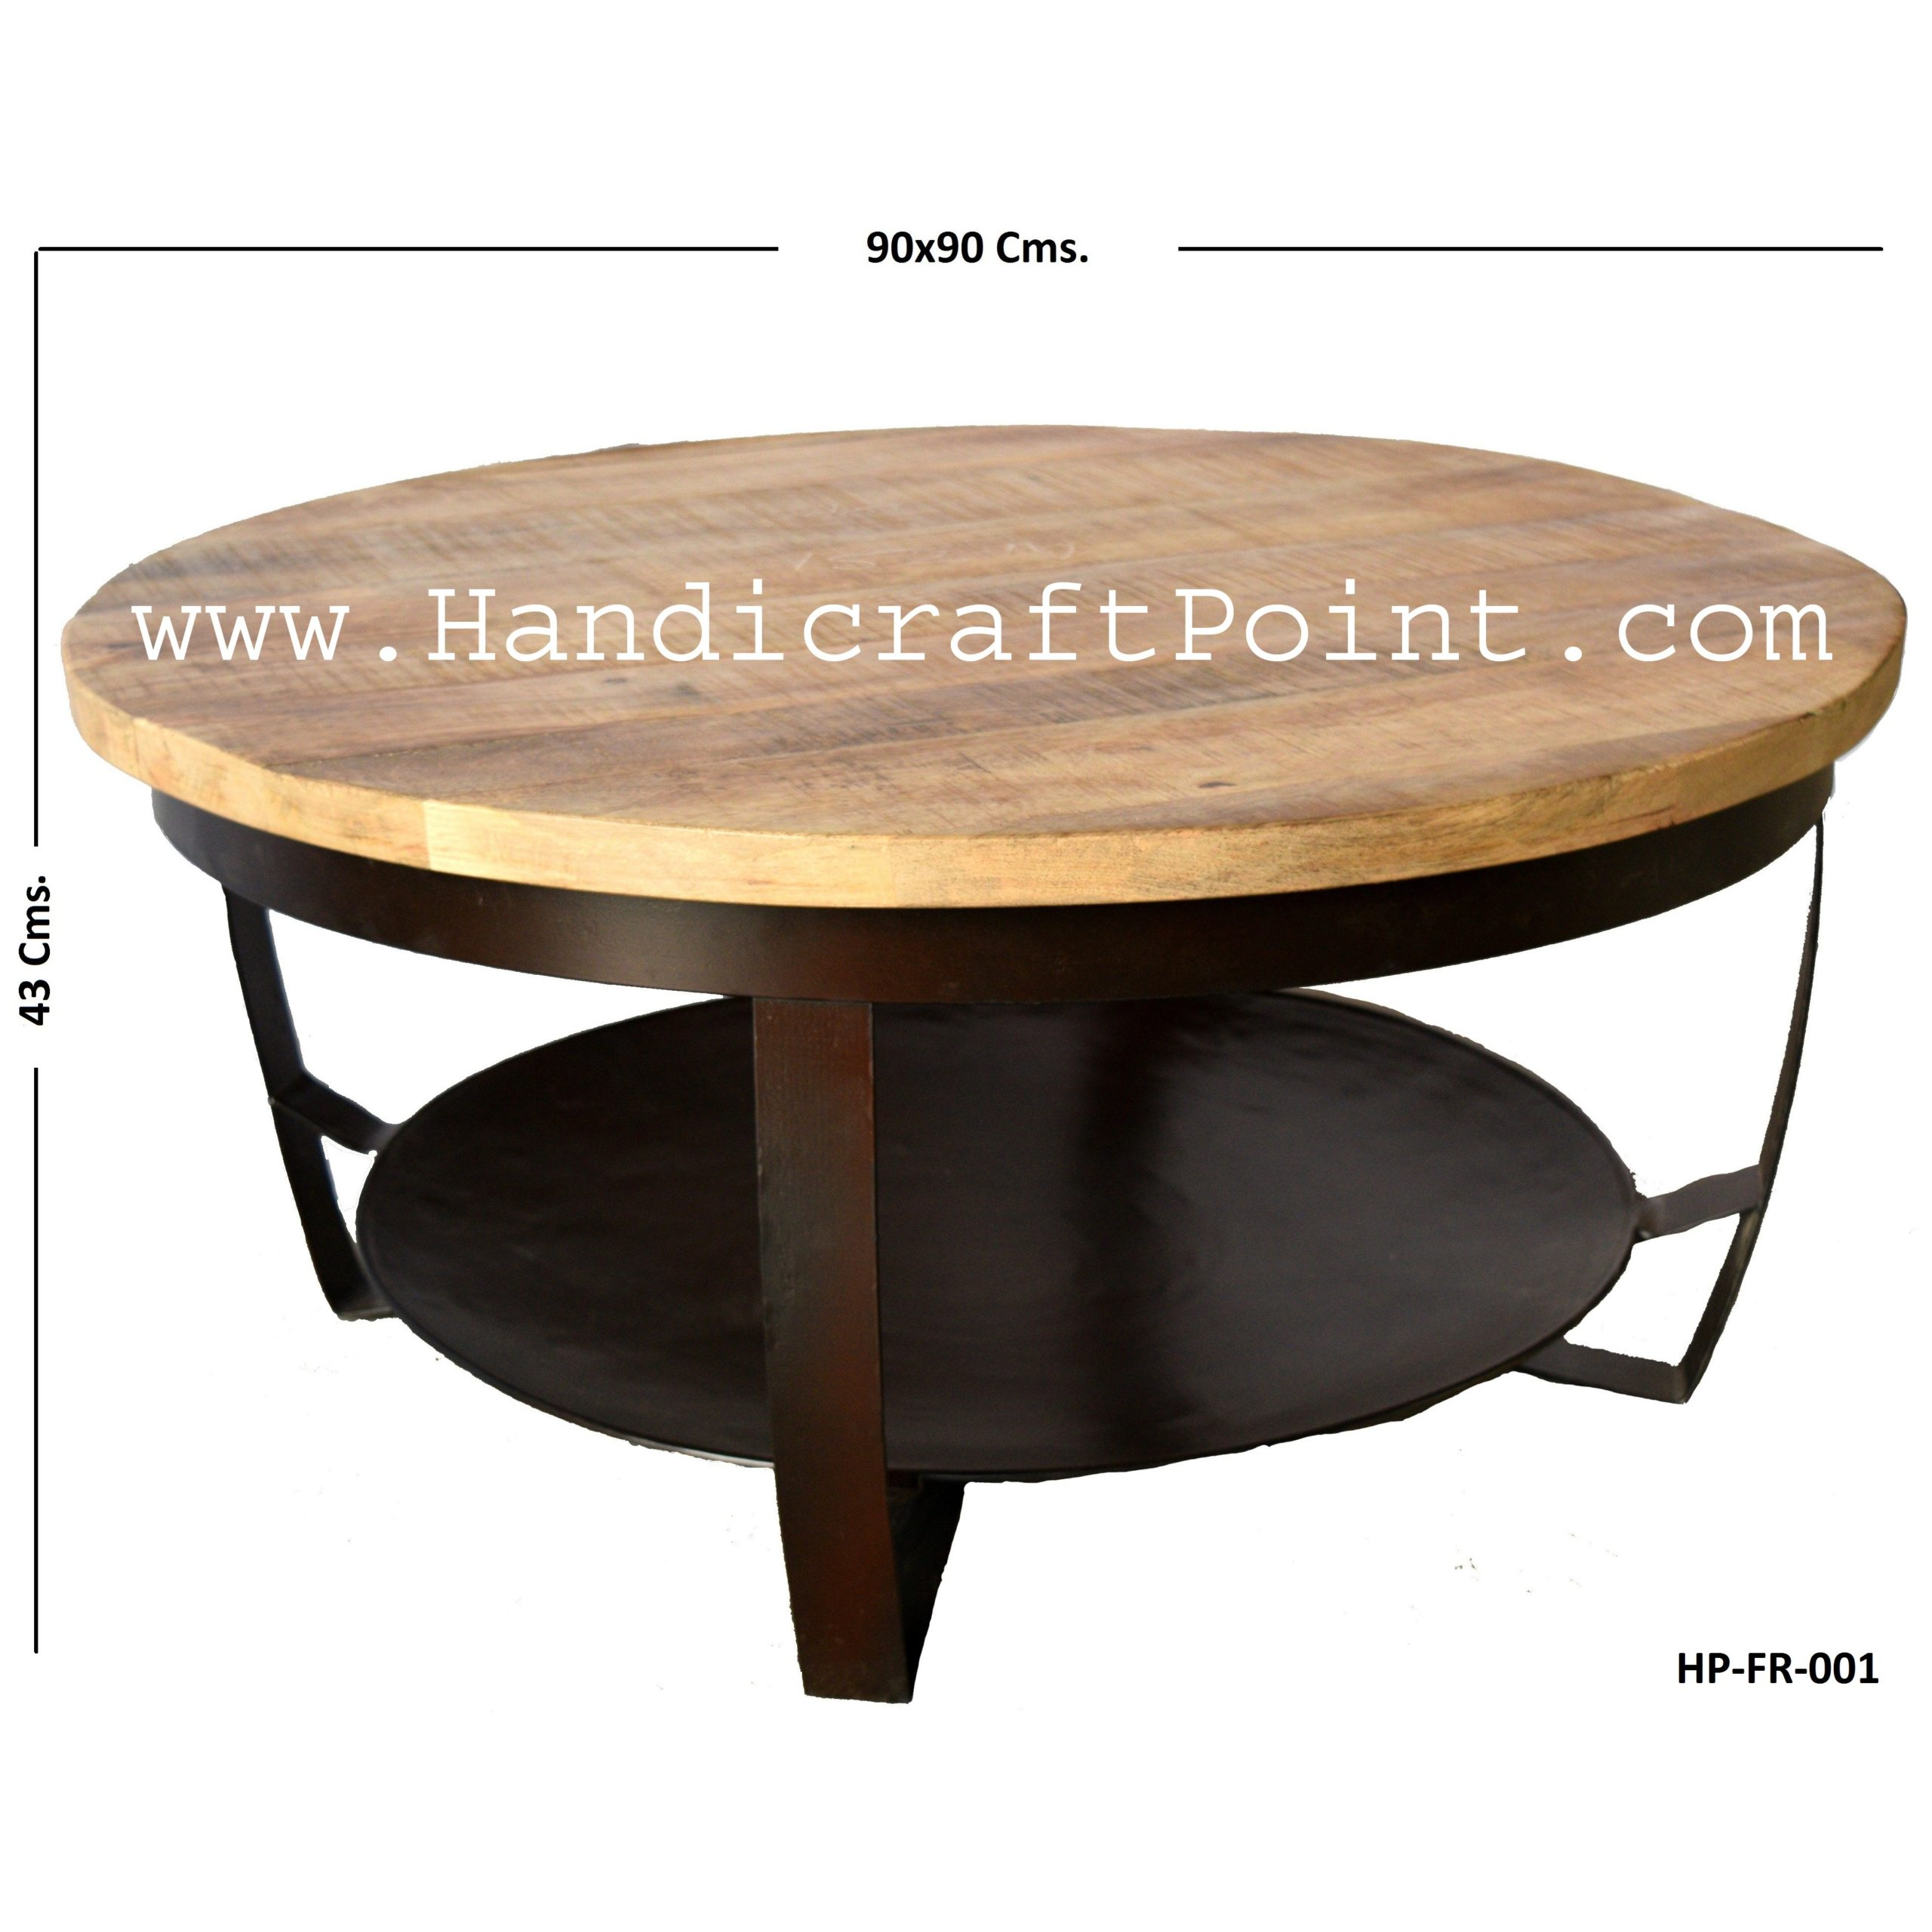 Wonderbaarlijk Industrieel Salontafel mangohout rond Industrial Coffee Table Round RA-41